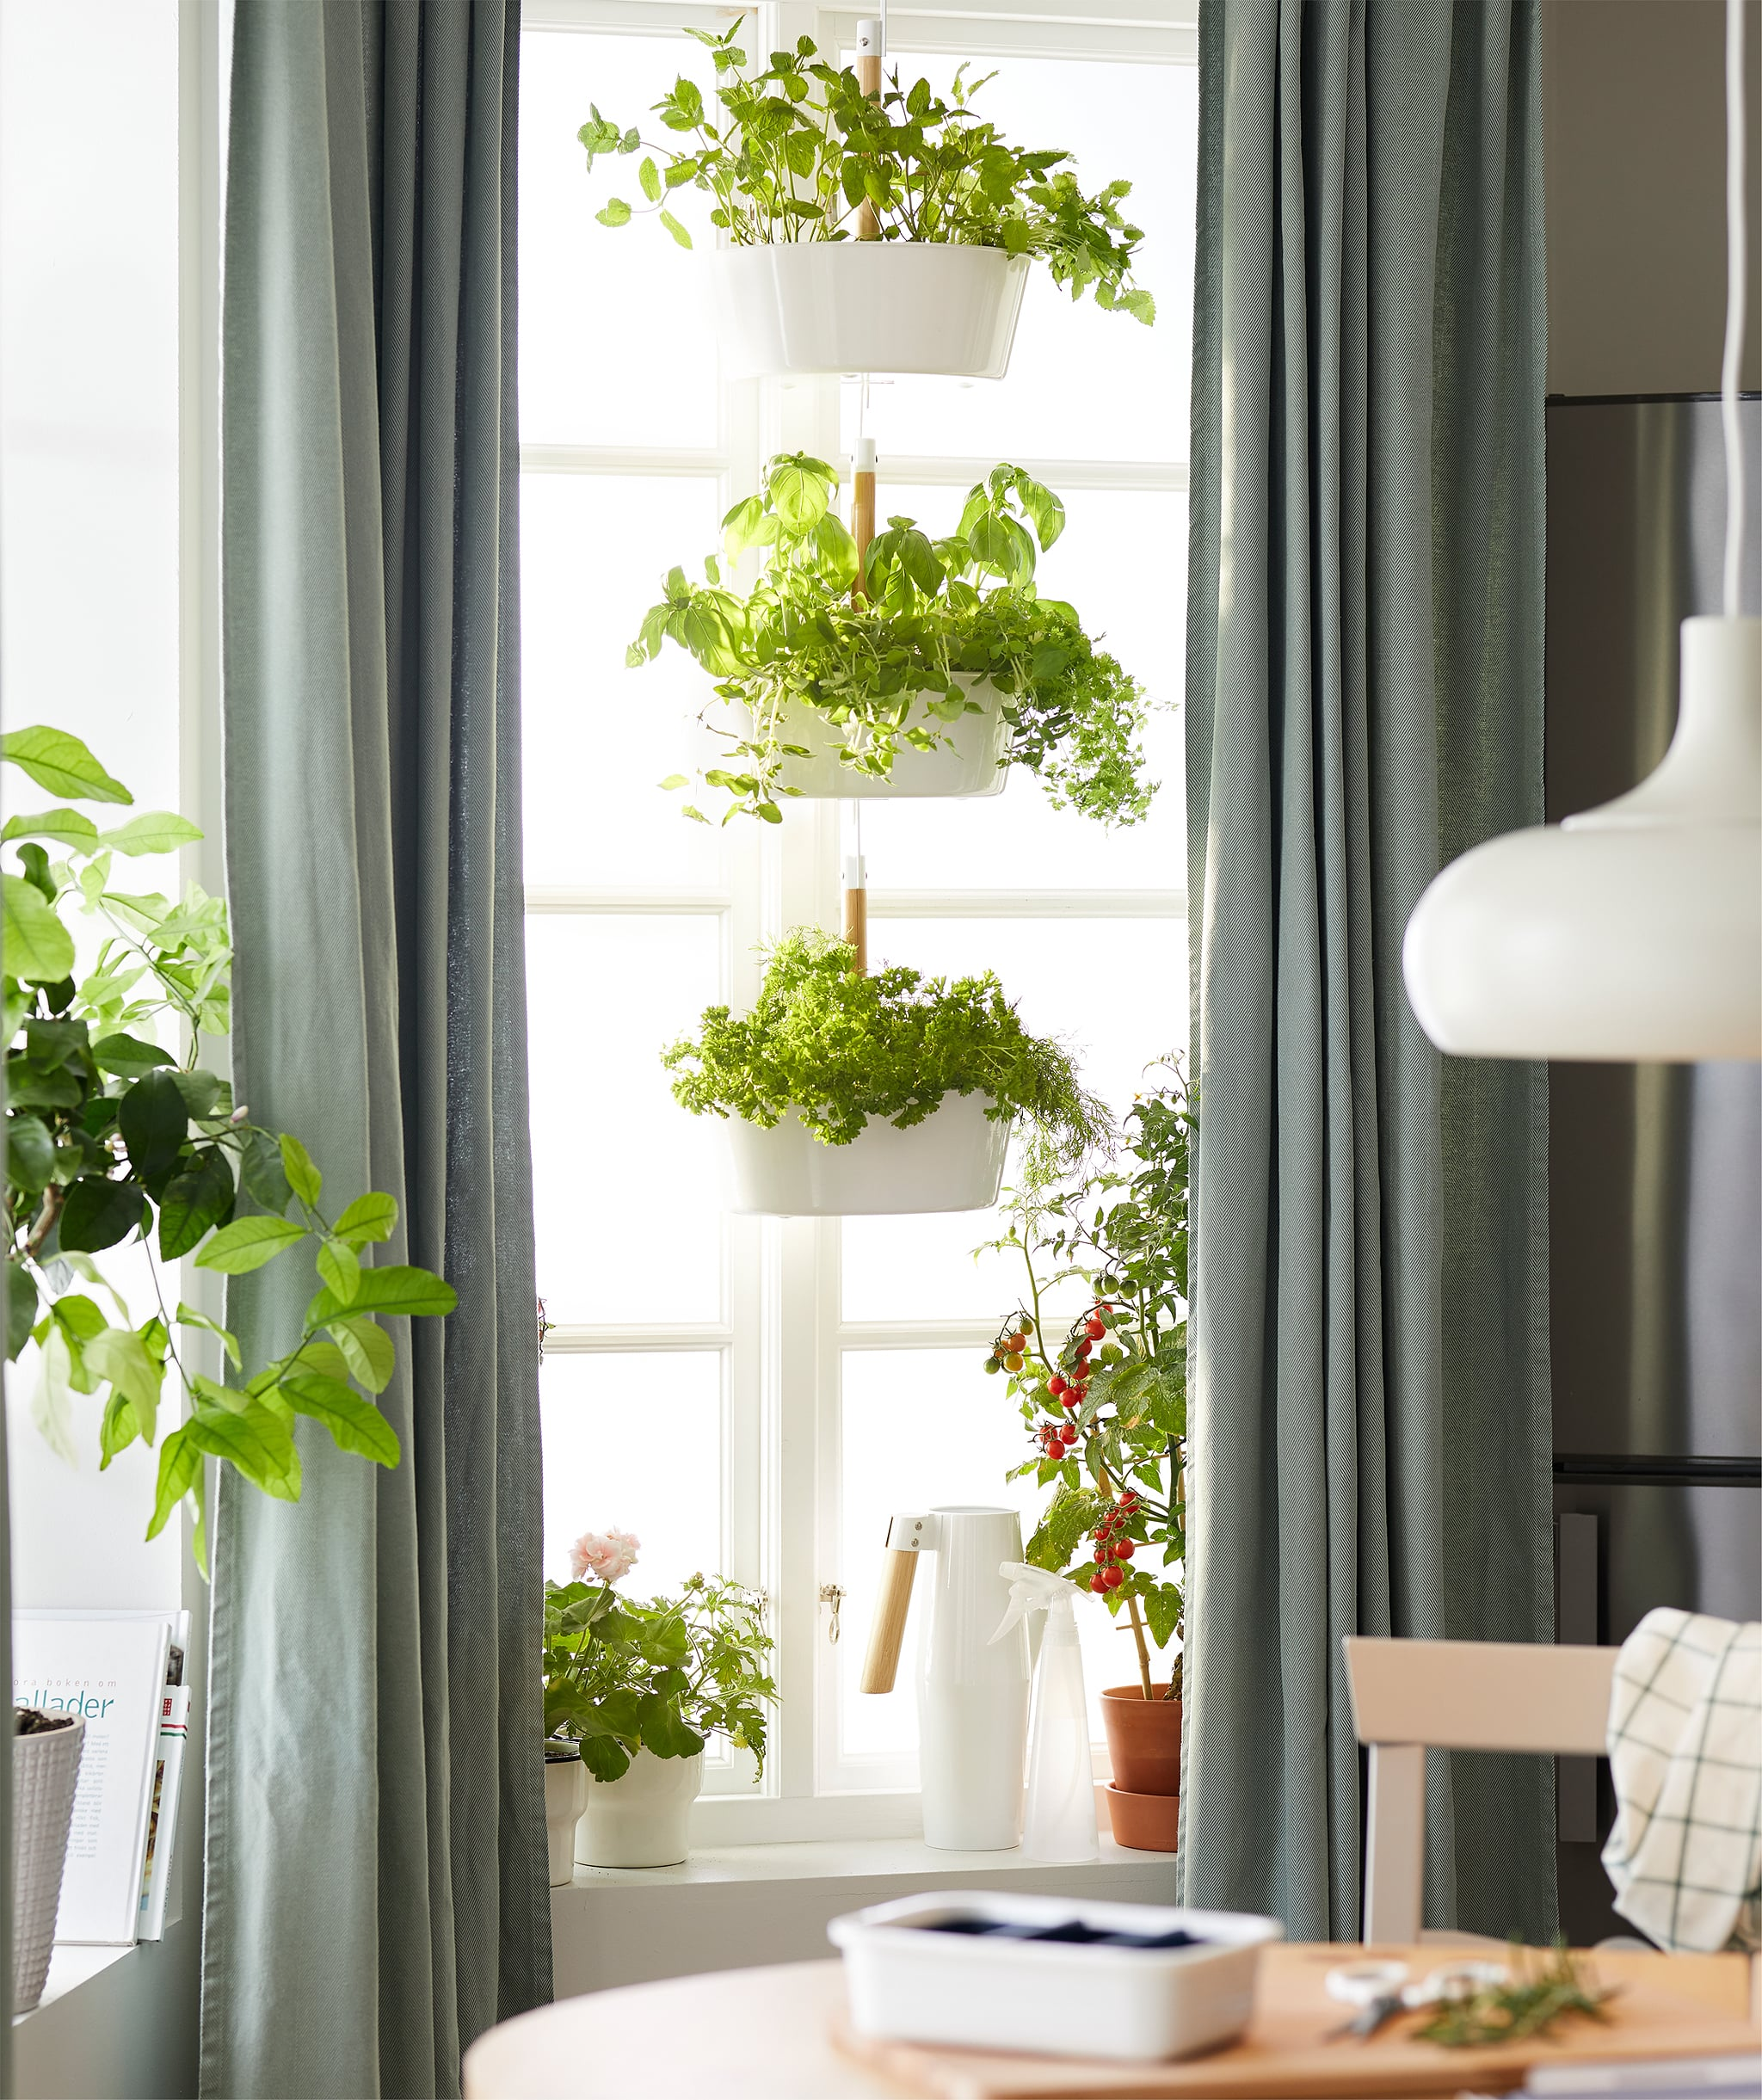 Interior dapur dengan jendela besar yang dihiasi tanaman sayur, baik di ambang jendela maupun di pot gantung tiga tingkat.